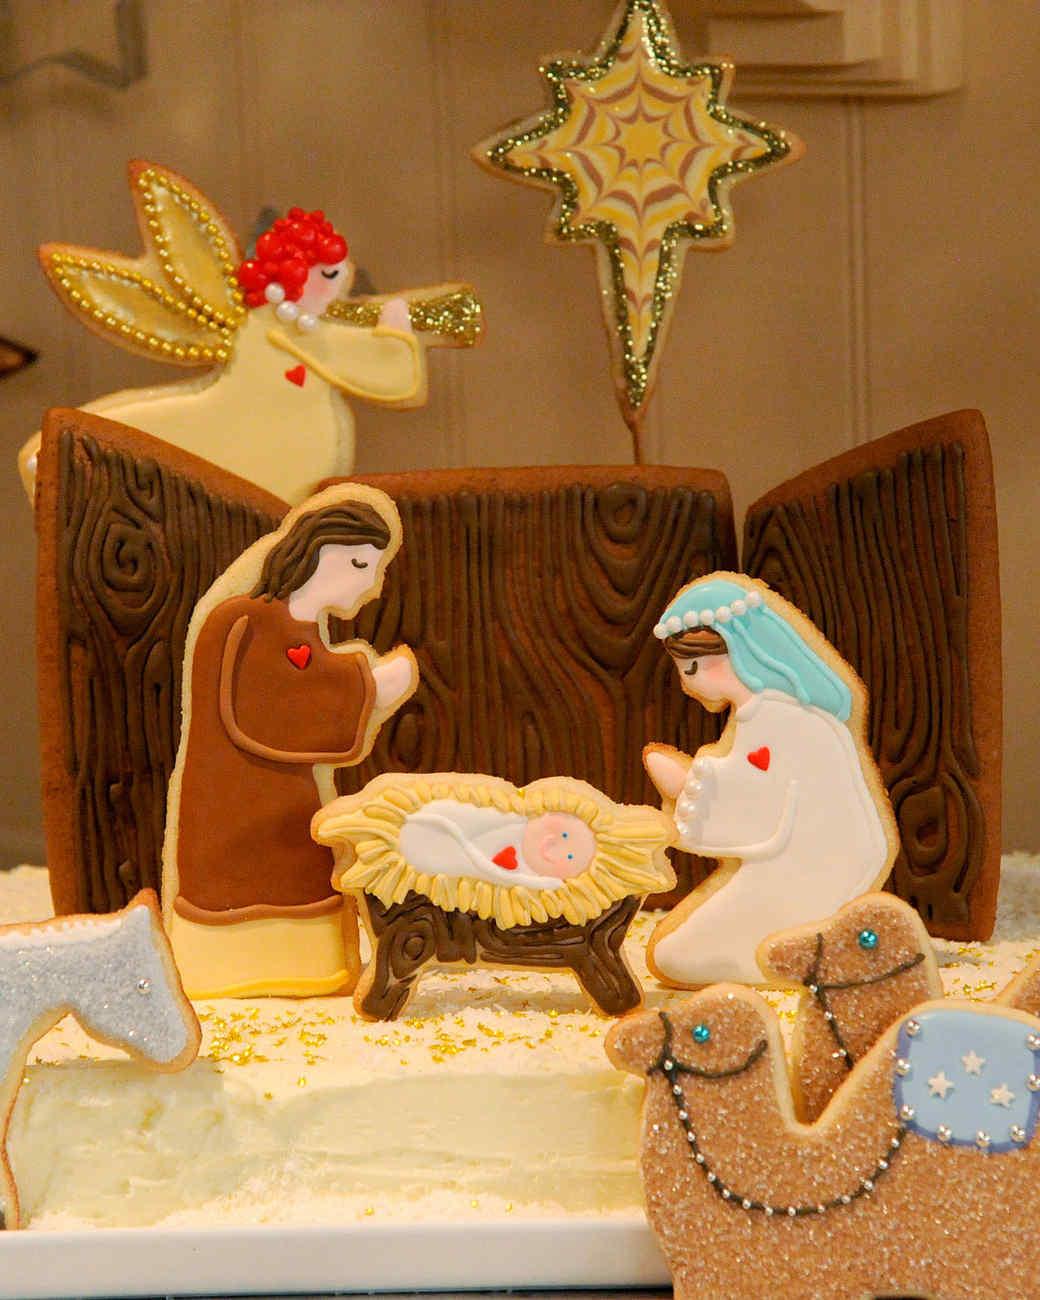 nativity-scene-creche-mslb7056.jpg